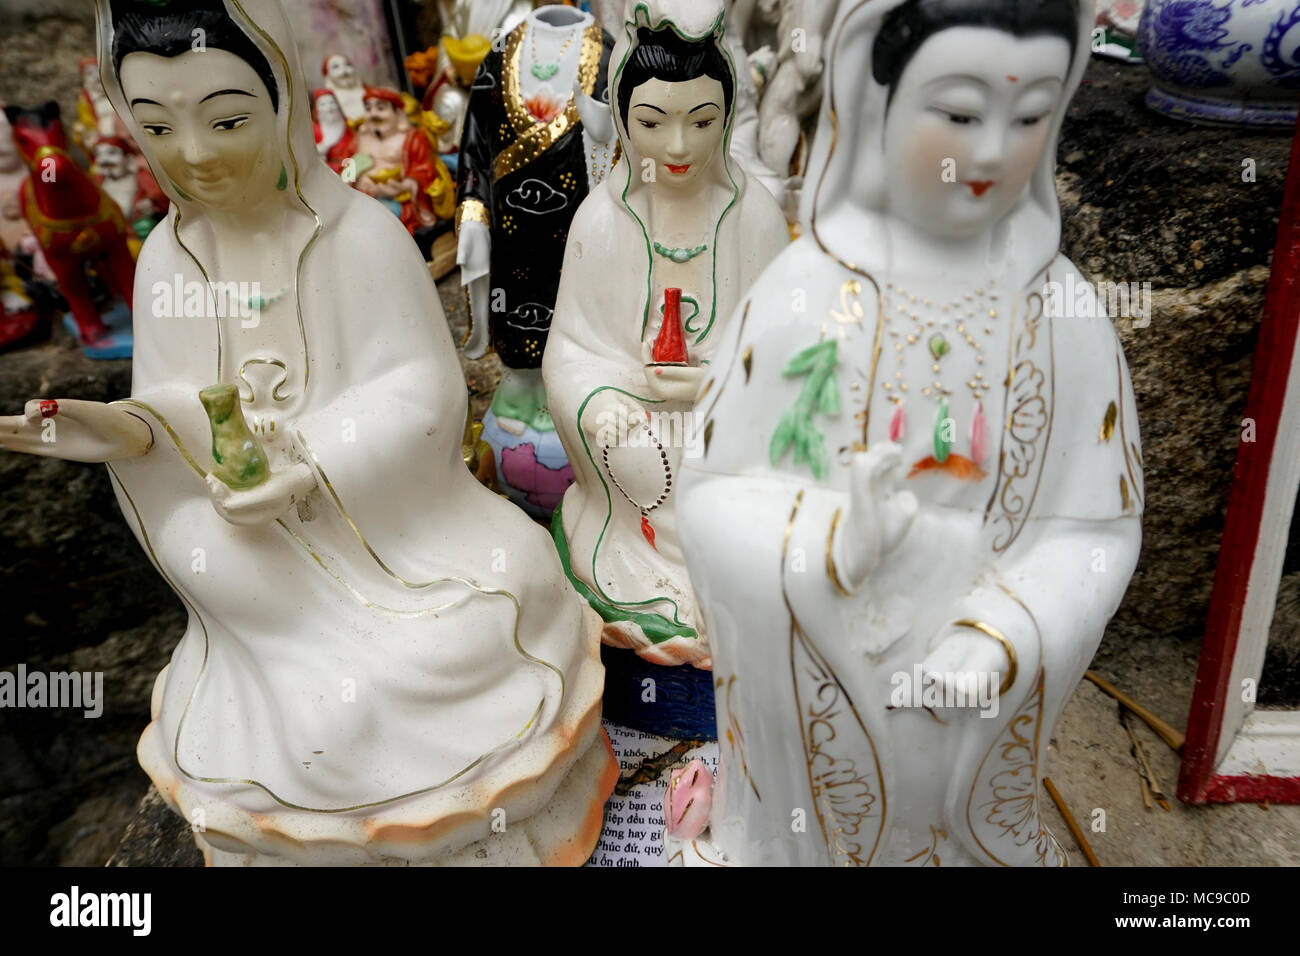 Chua Long Son Pagoda, Nha Trang, Vietnam. Guanyin, goddess of mercy, is worshipped throughout China and Vietnam. Stock Photo